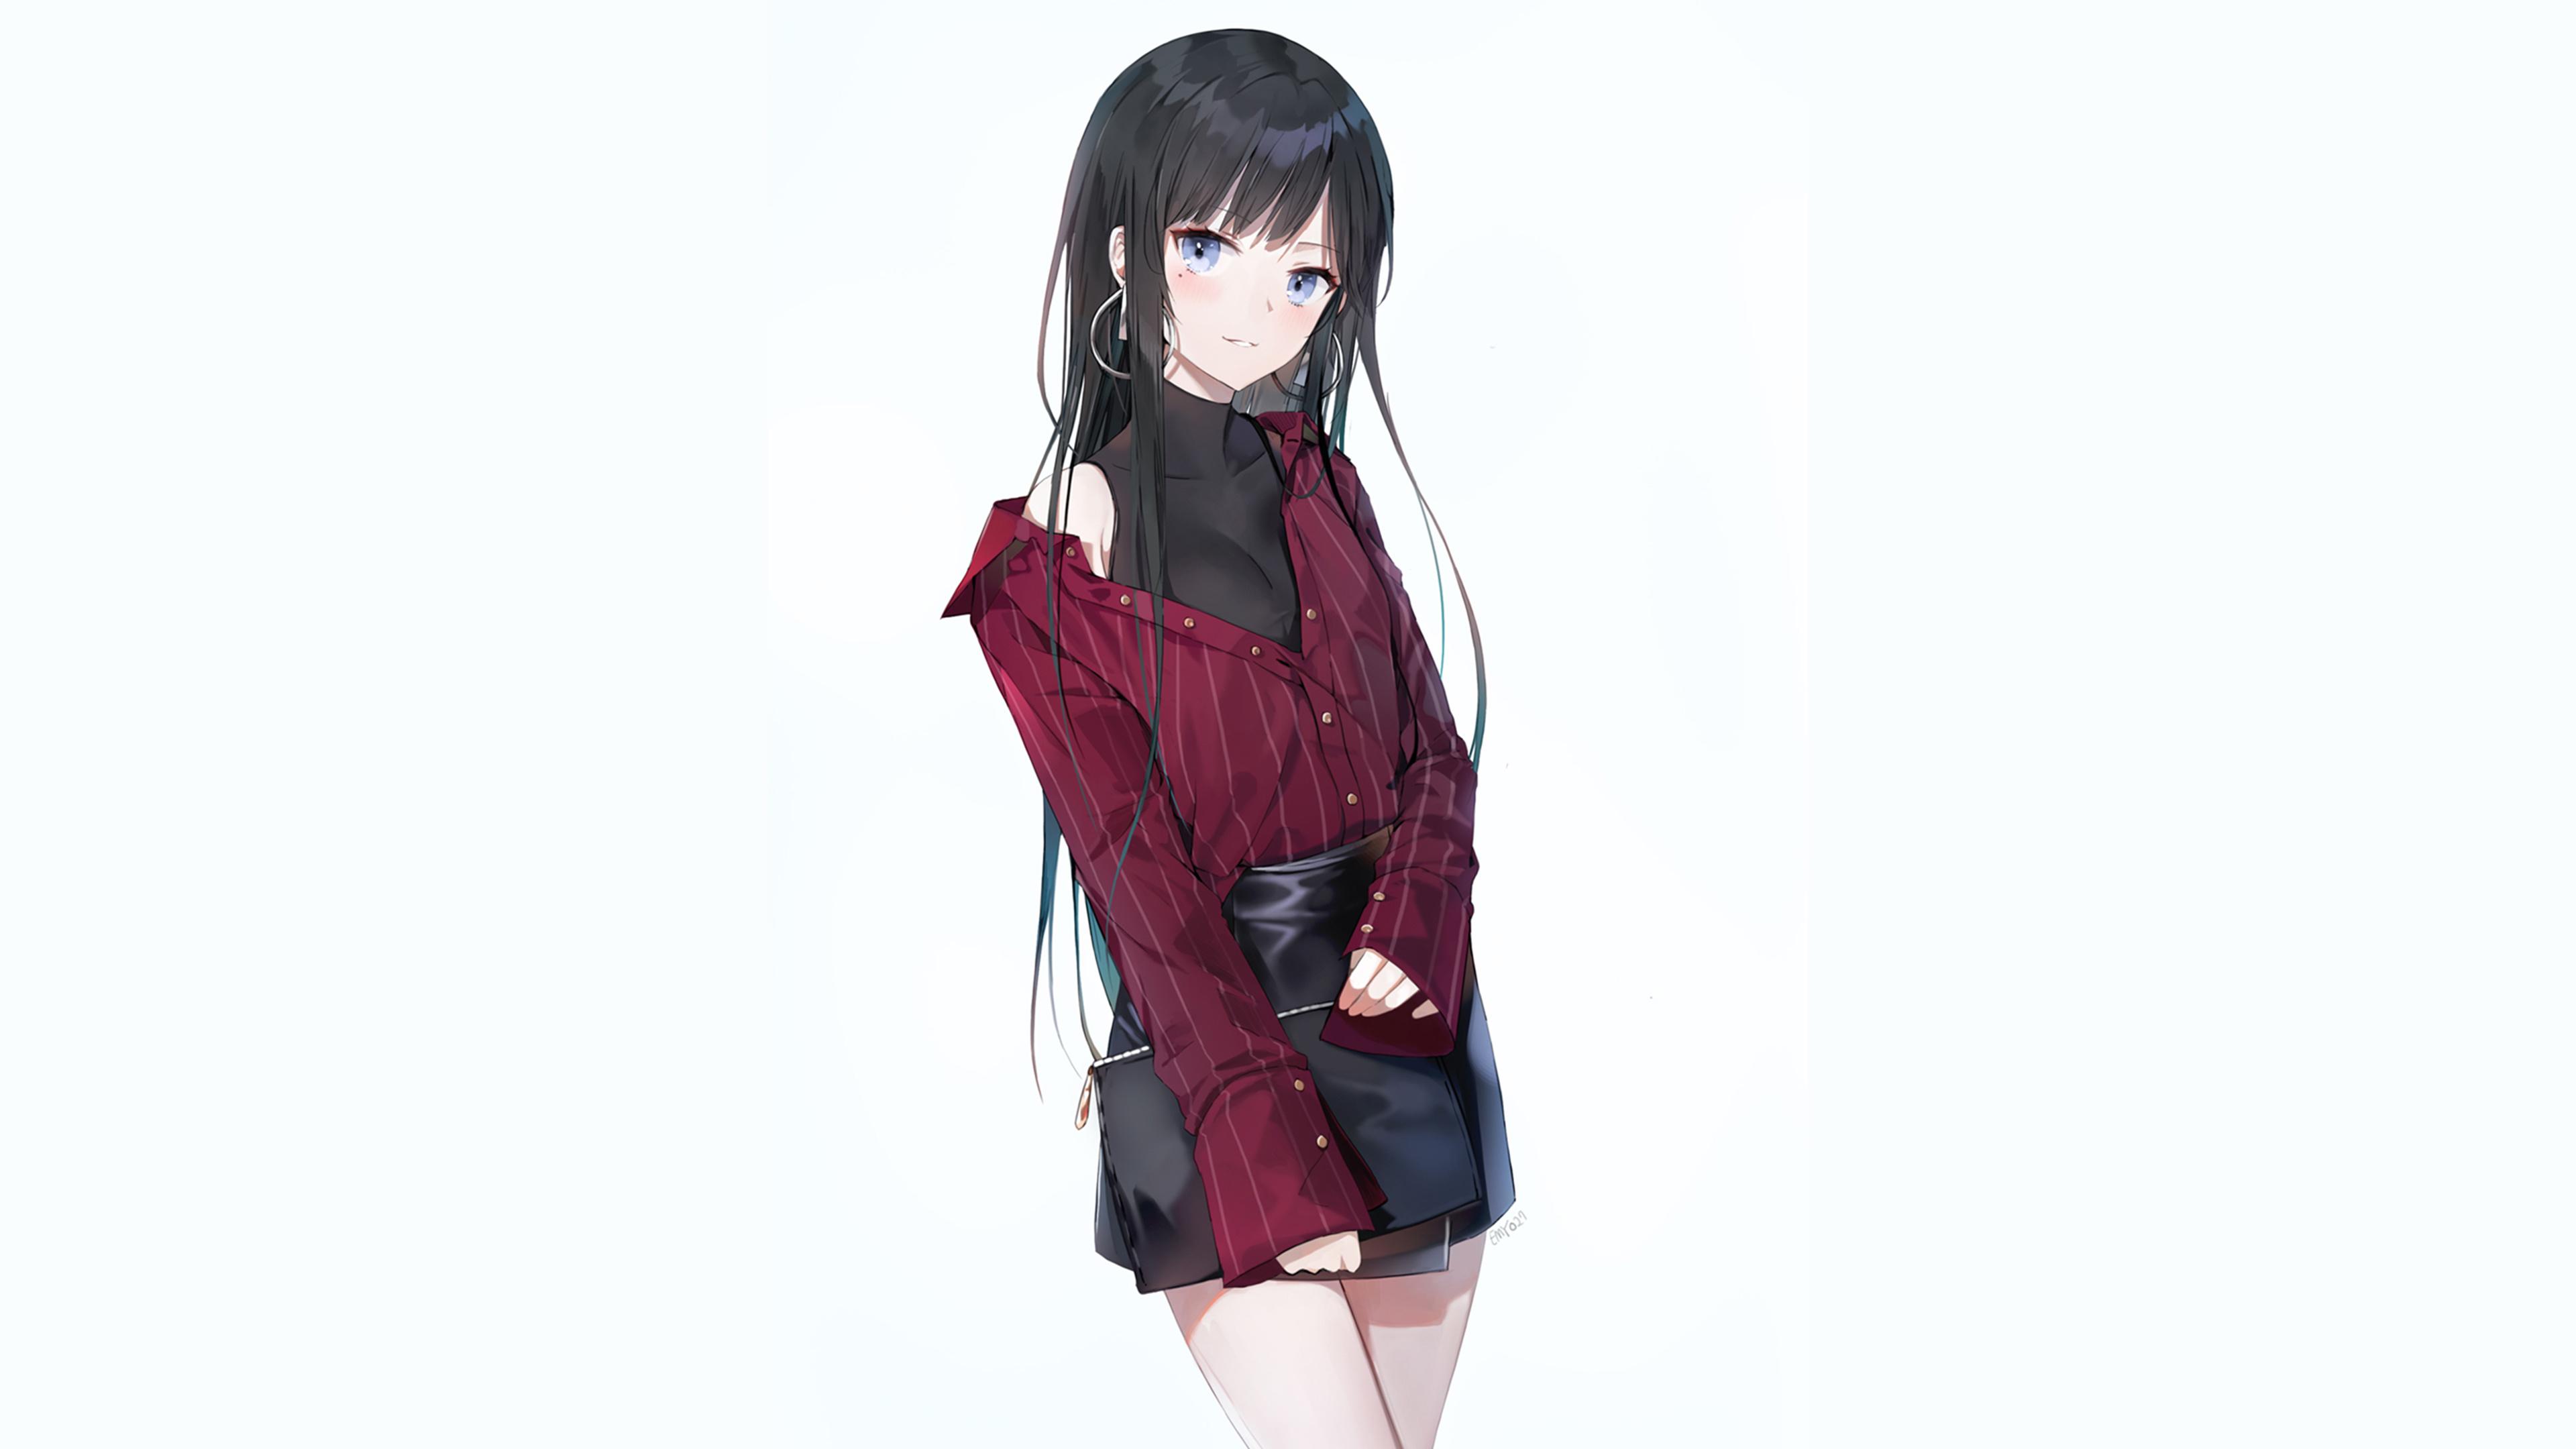 Download 3840x2400 Wallpaper Original Anime Girl Cute Smile 4k Ultra Hd 16 10 Widescreen 3840x2400 Hd Image Background 7319